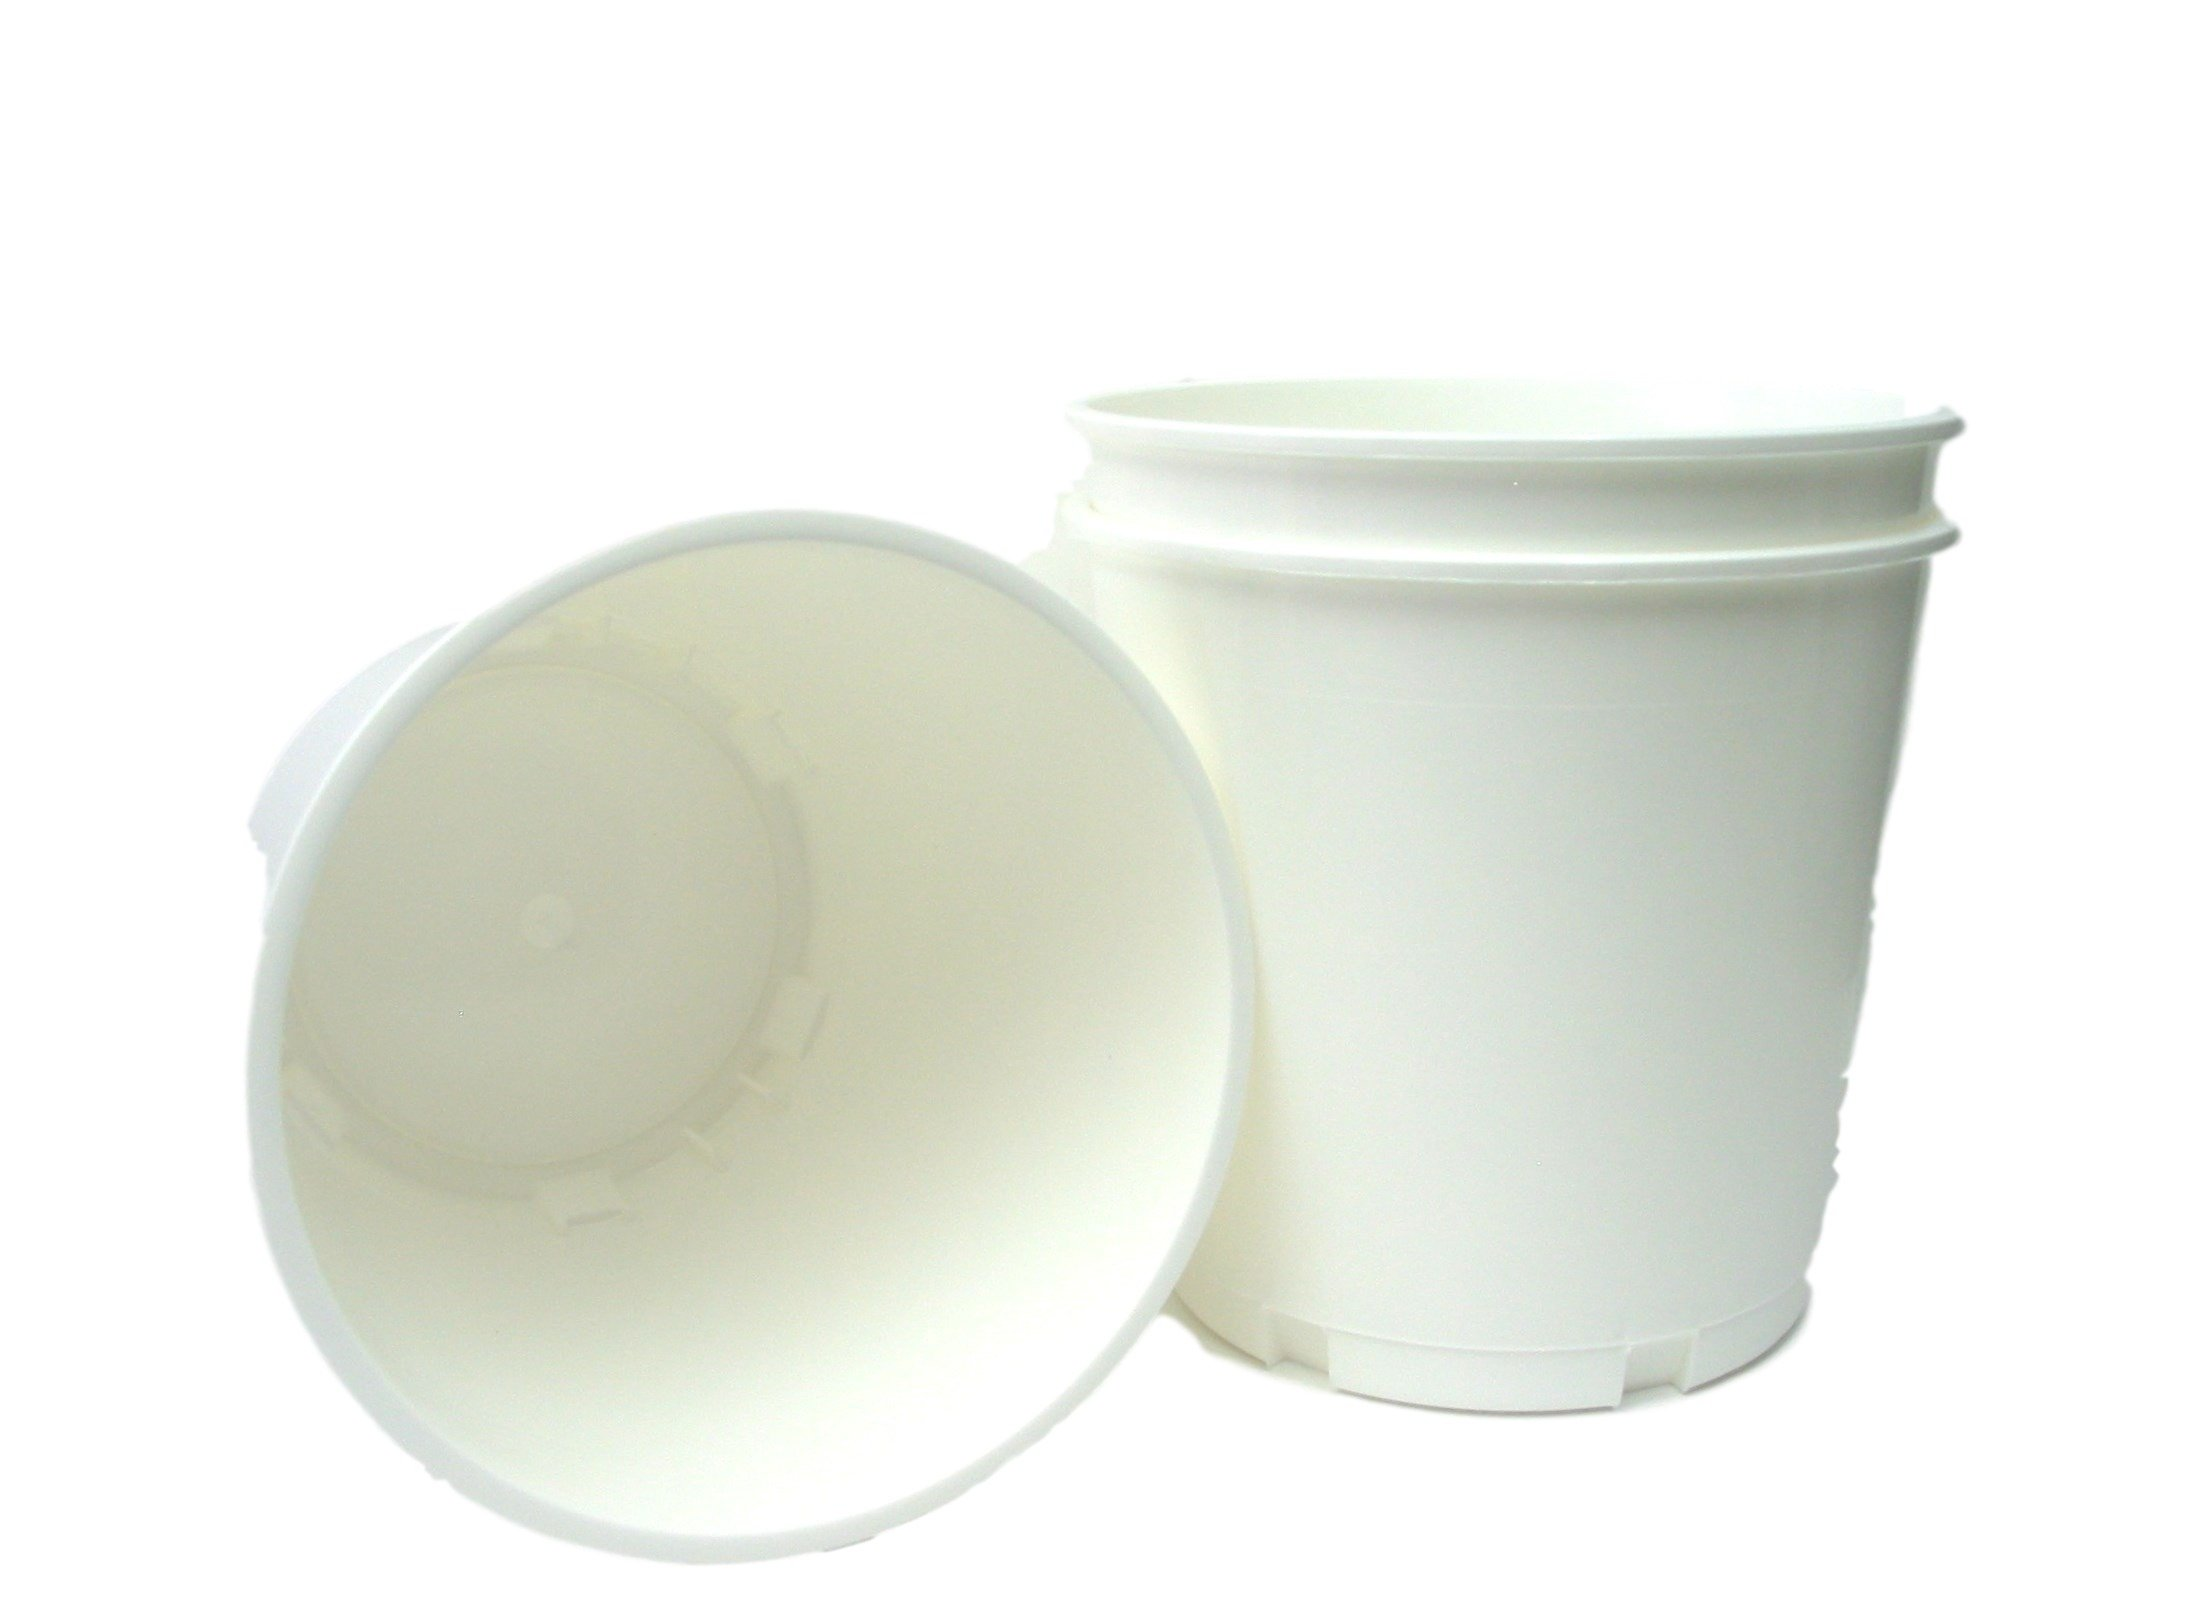 Talisman Utility Buckets, 176 Ounces, Pack 3, Color White